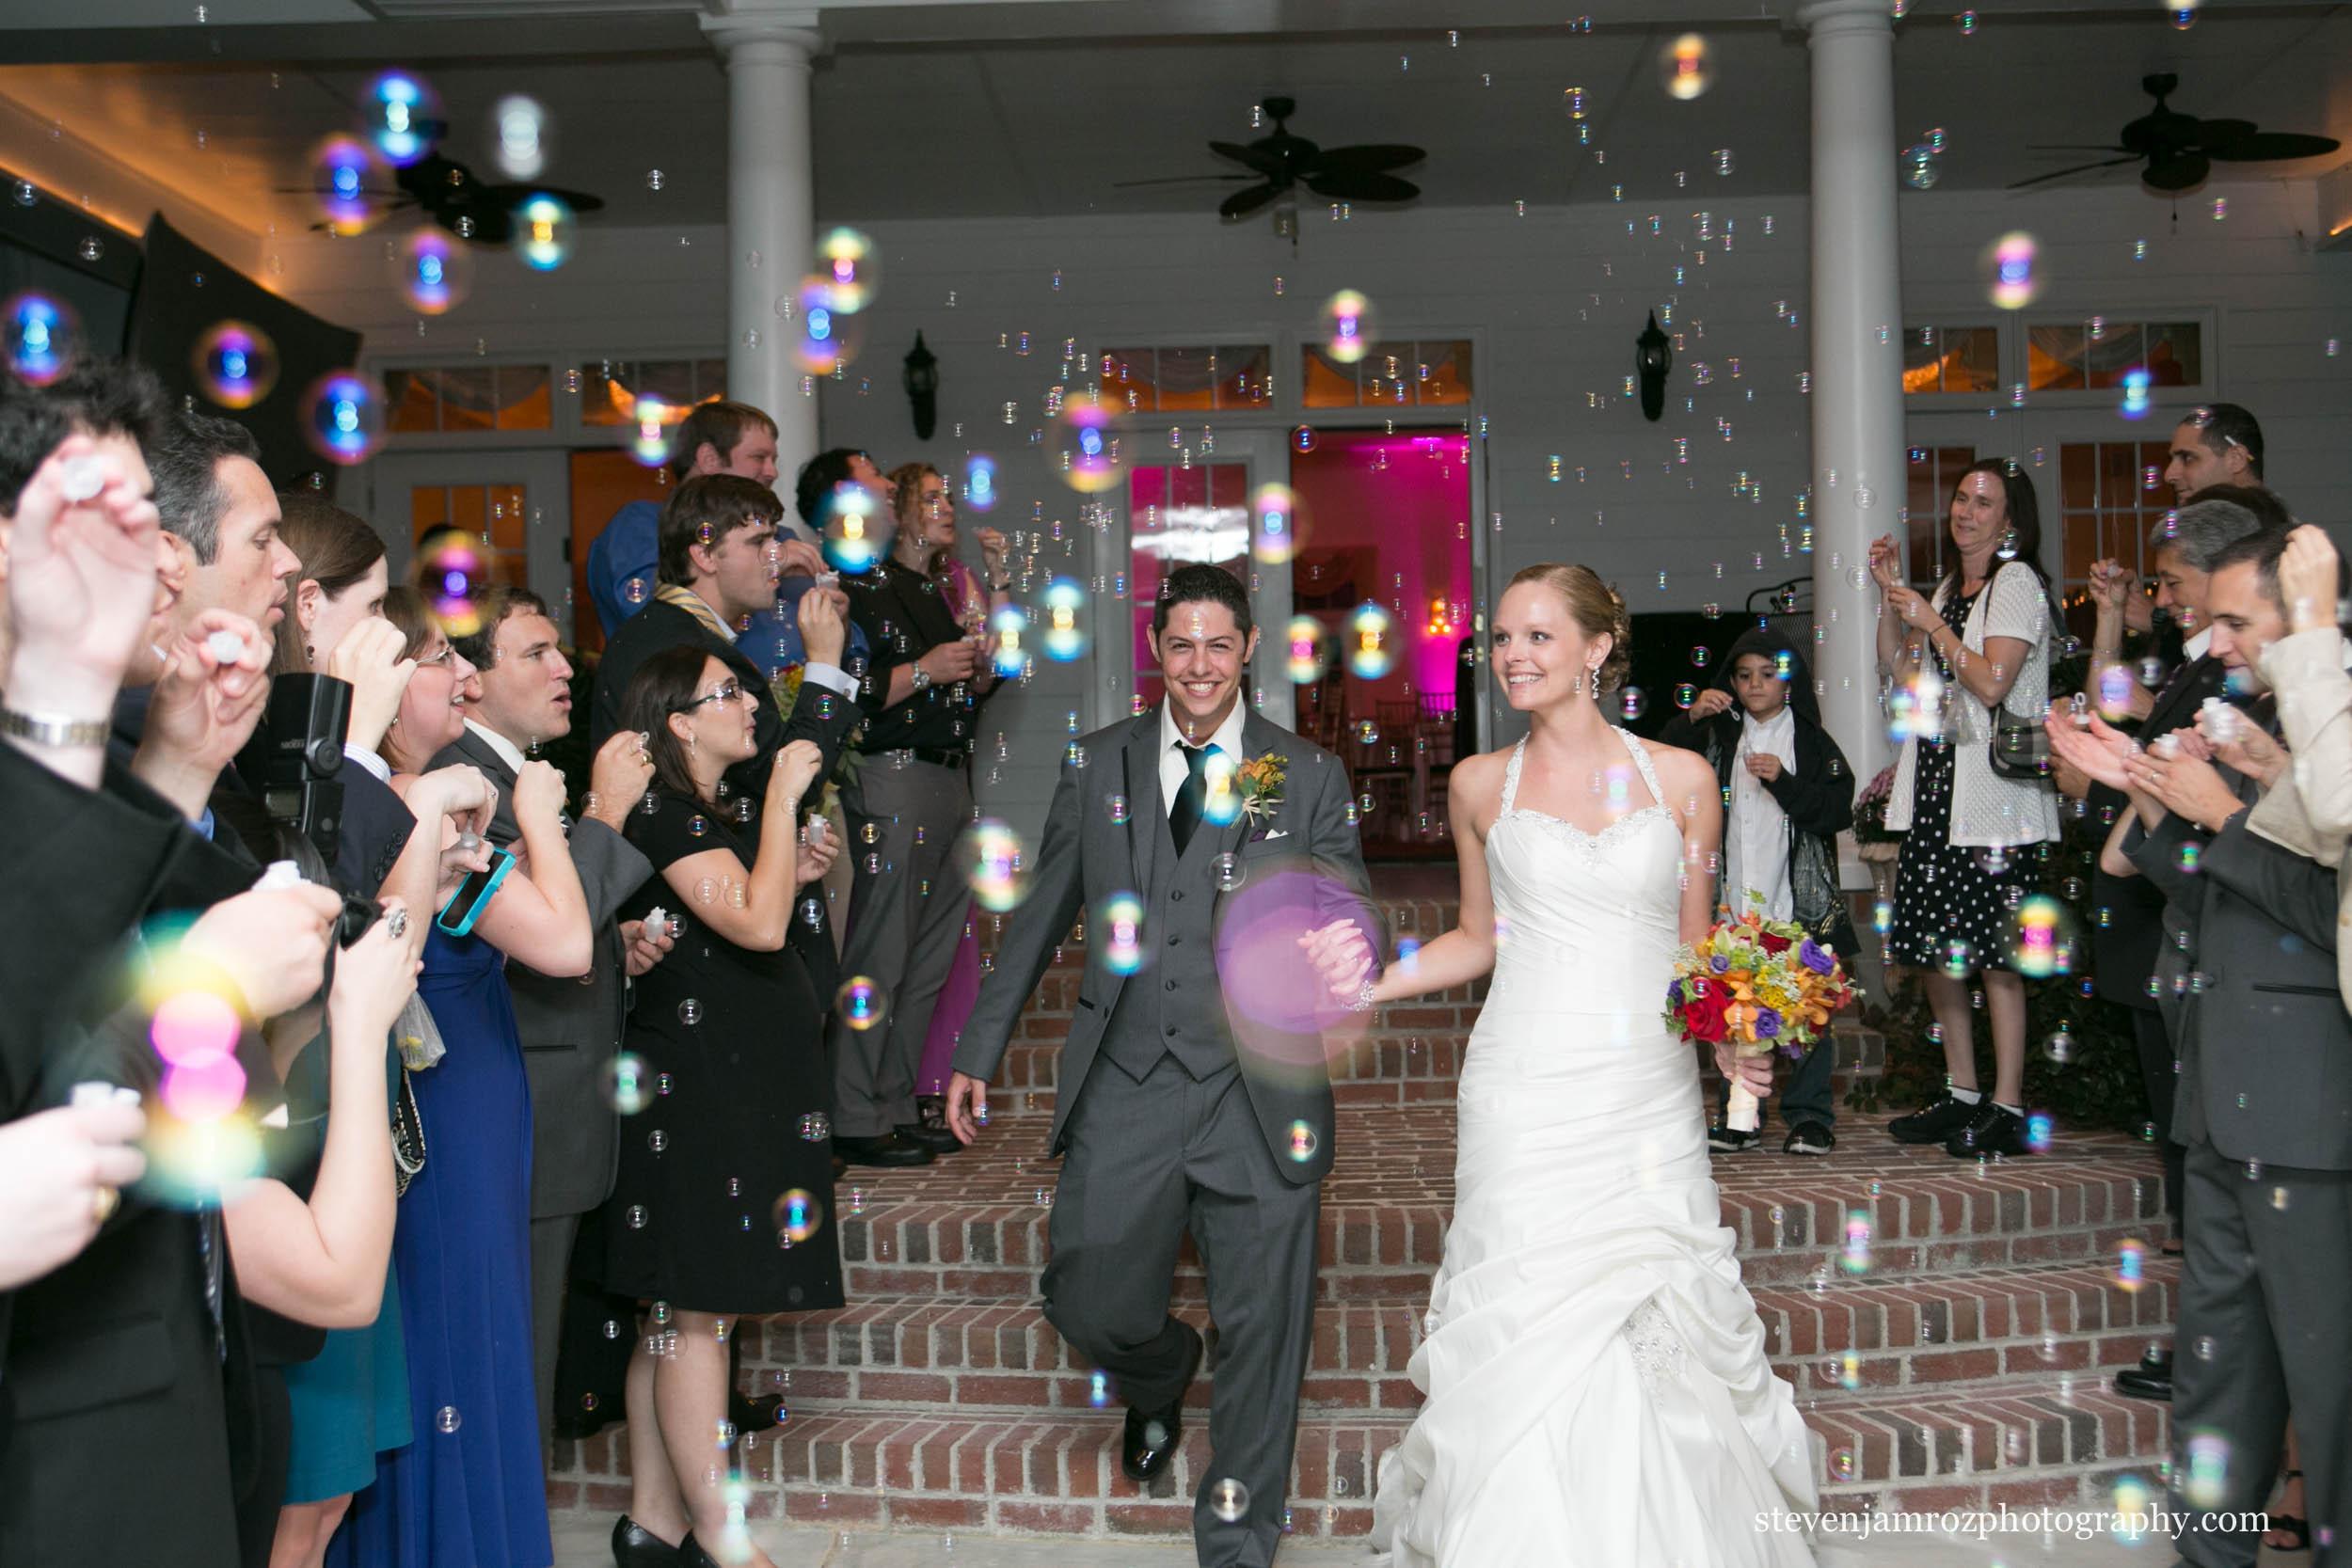 reception-grand-ballroom-hudson-manor-steven-jamroz-photography-0419.jpg